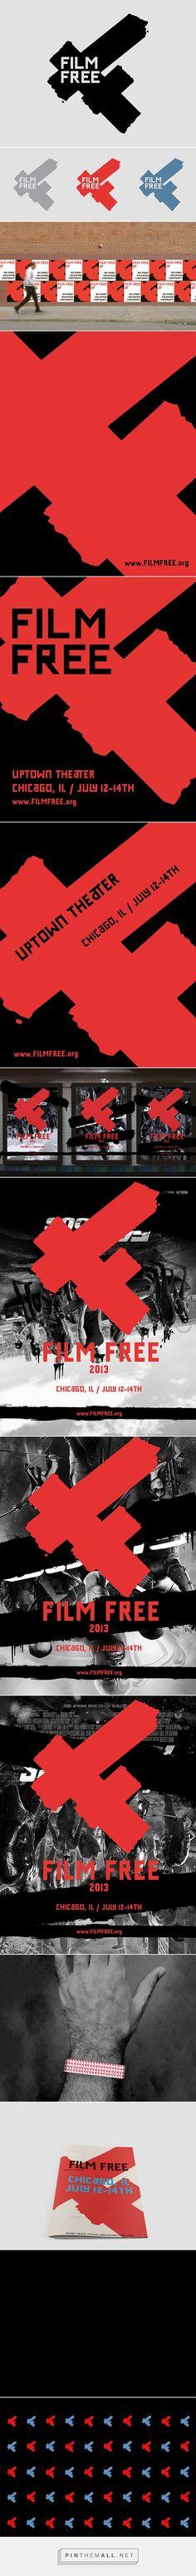 Film Festival Branding and Environmental on Behance - created via https://pinthemall.net